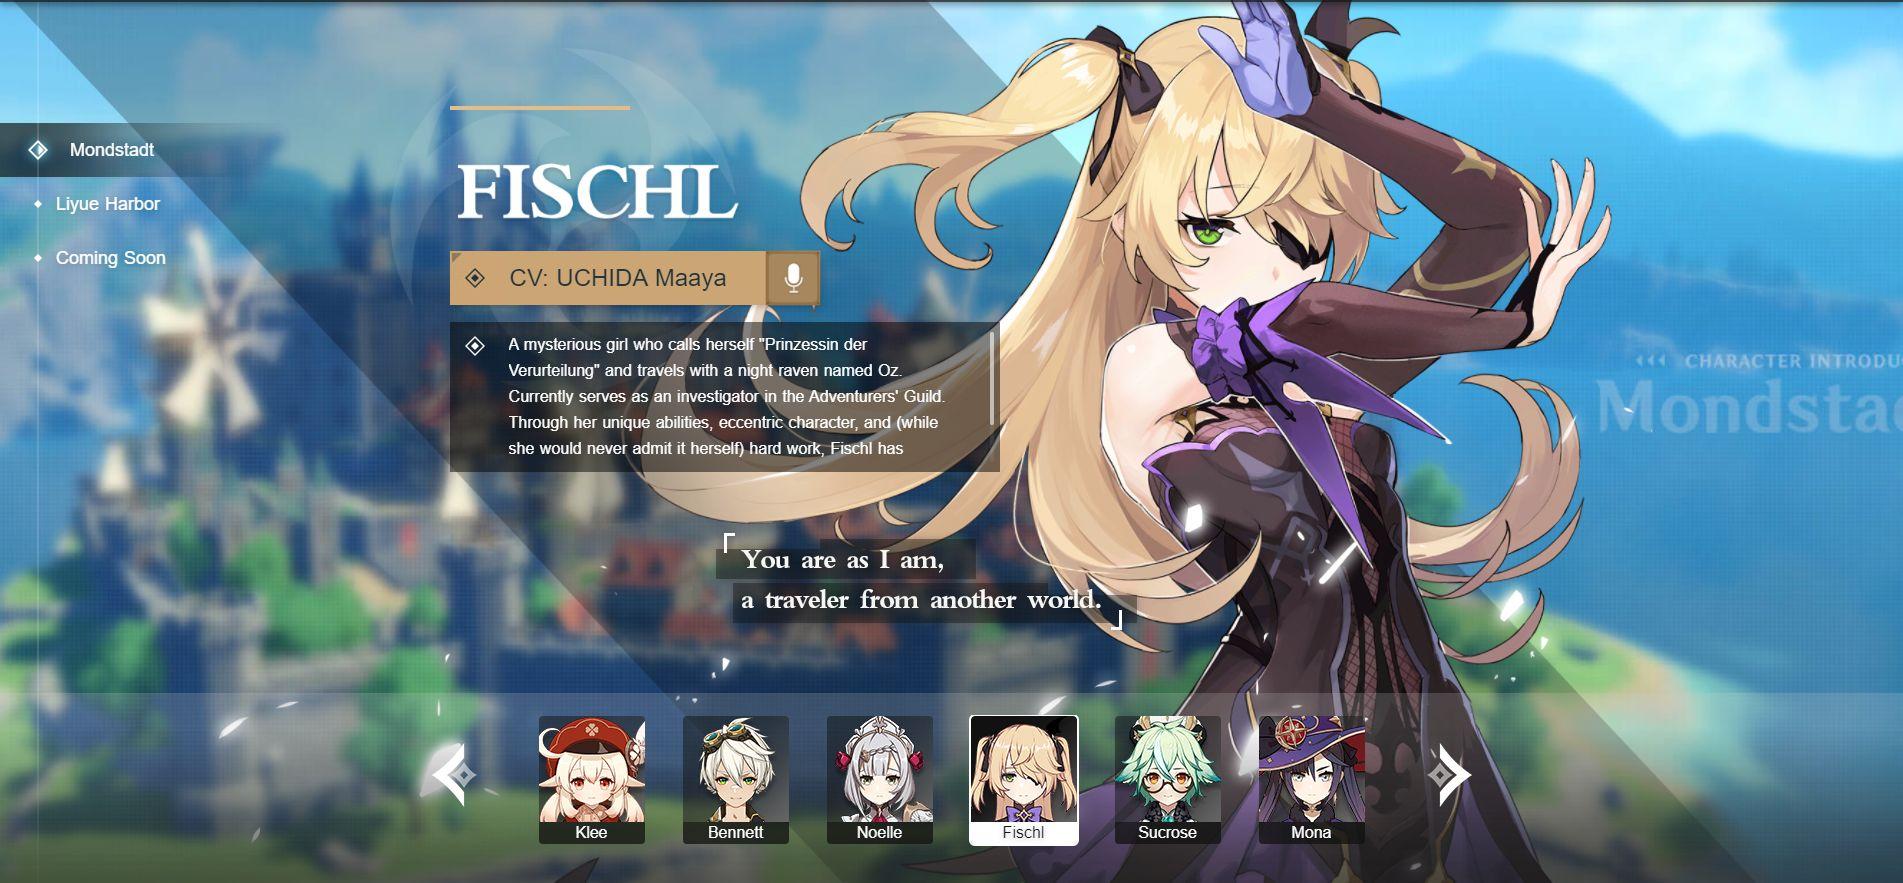 Genshin Impact (2020) - recenzja gry - rascal.pl